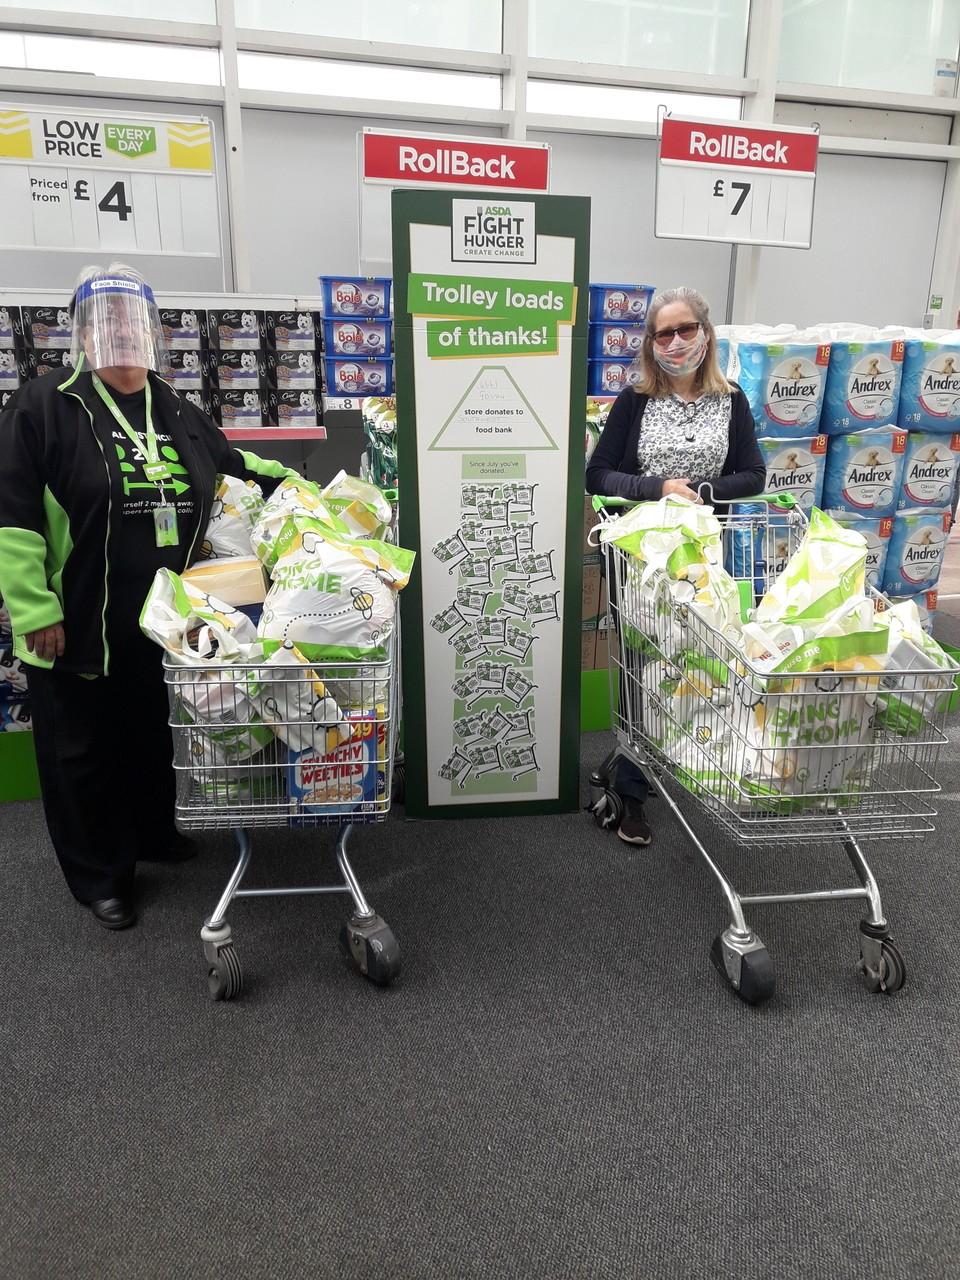 Thanks to Asda Govan customers for supporting local food bank | Asda Govan